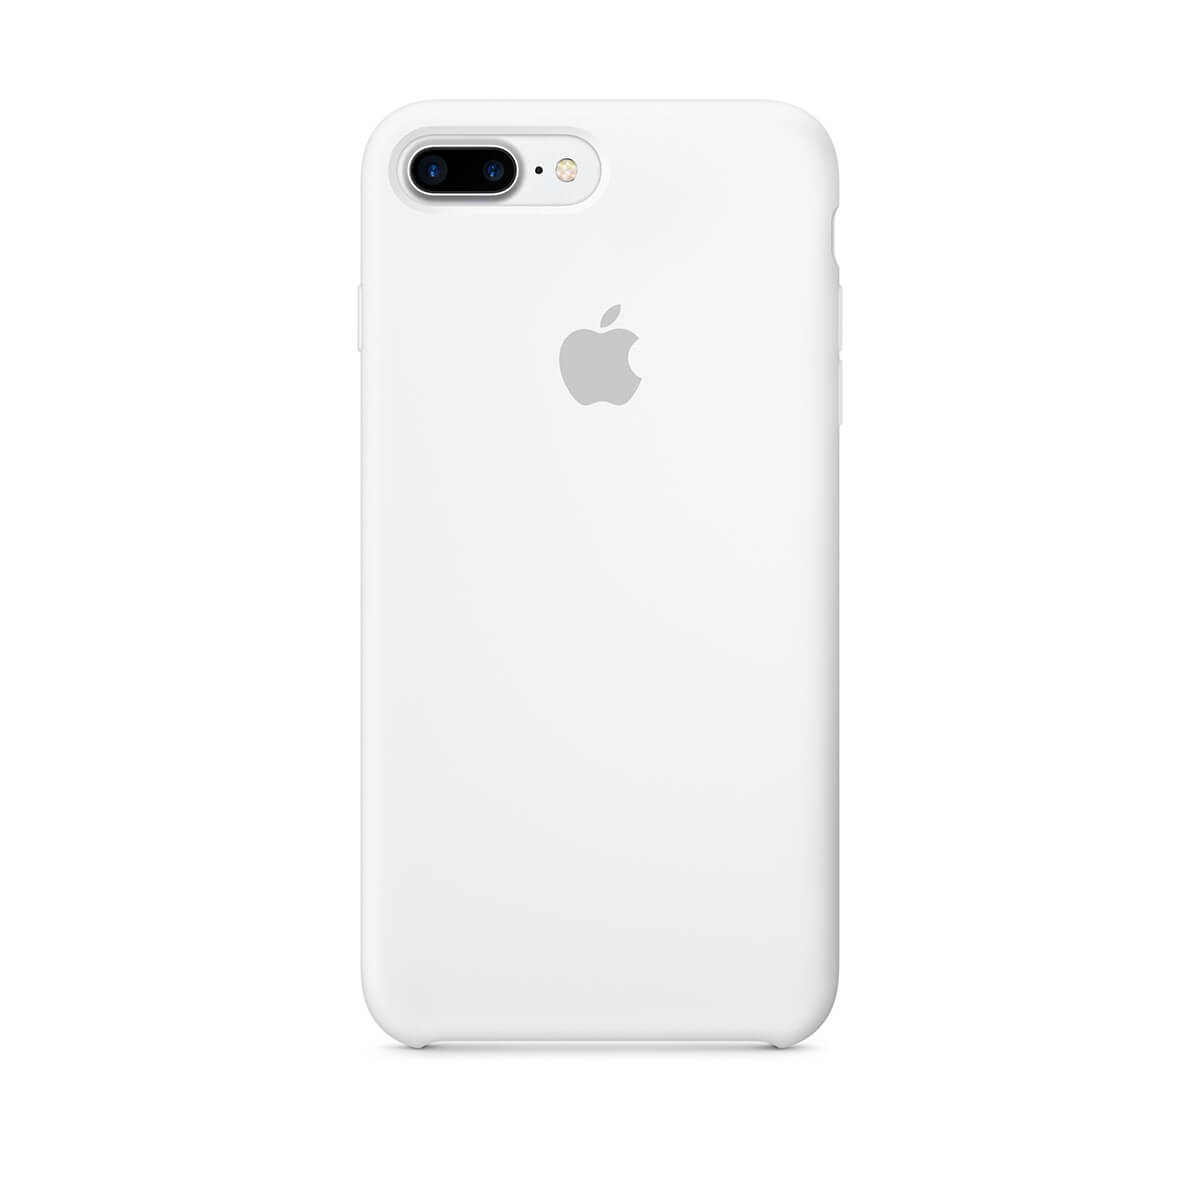 Silikonový kryt na iPhone 7 Plus – bílý mmqt2zm/a